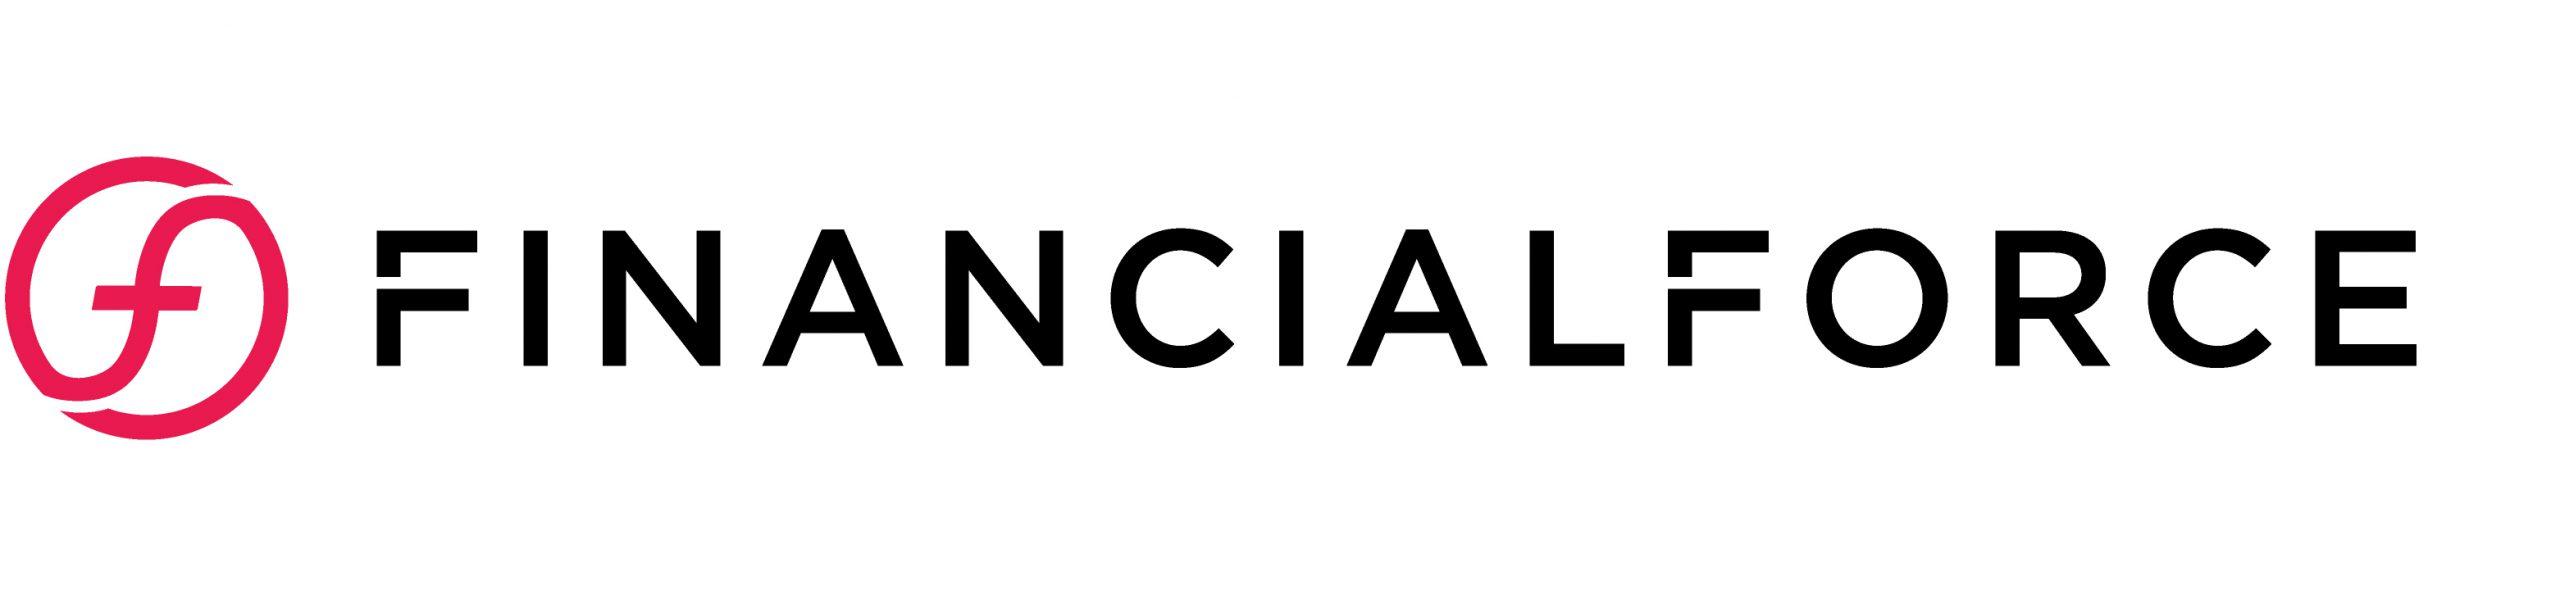 FinancialForce logo | LinkPoint360 Salesforce Partners